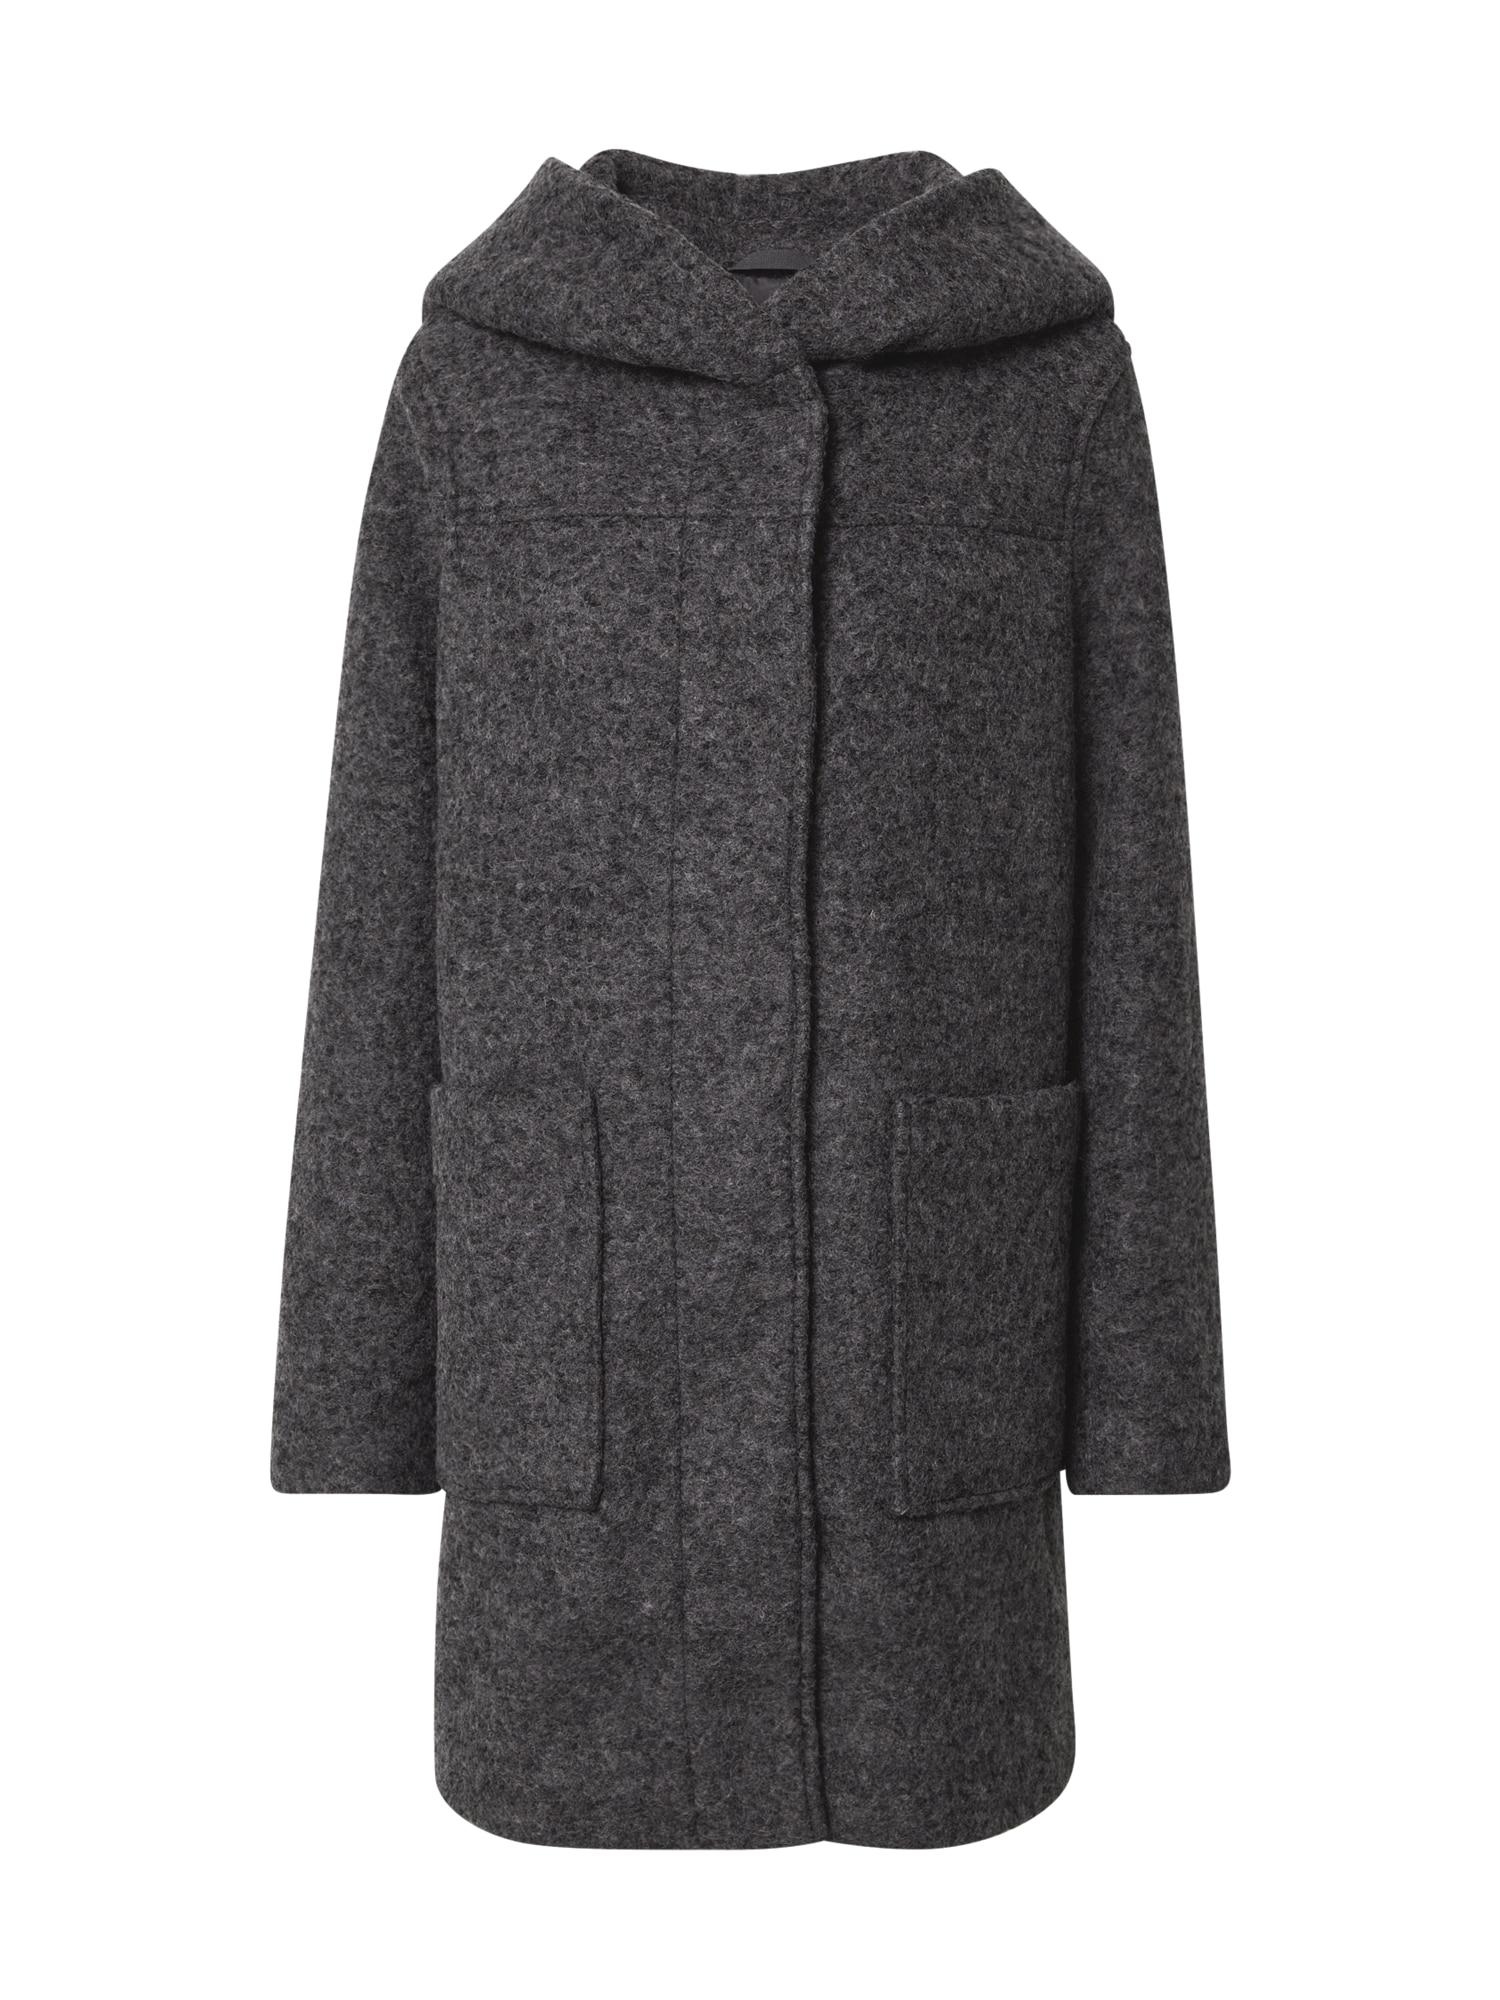 TOM TAILOR DENIM Demisezoninis paltas tamsiai pilka